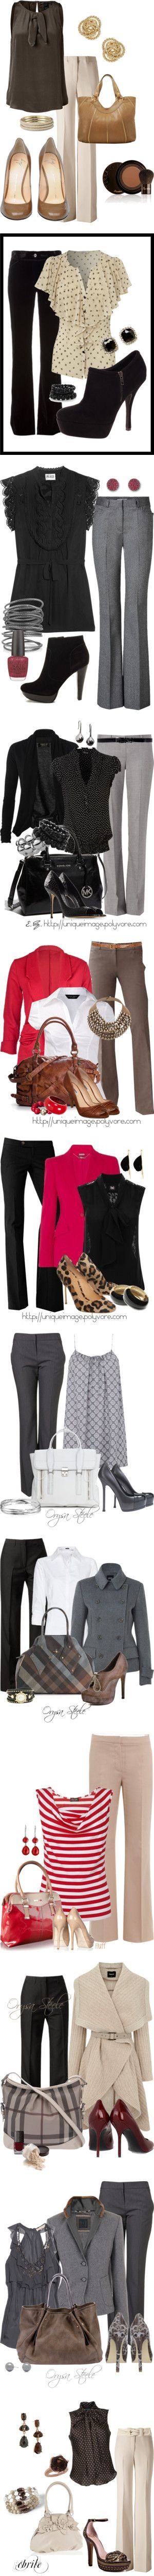 Cute work clothes!